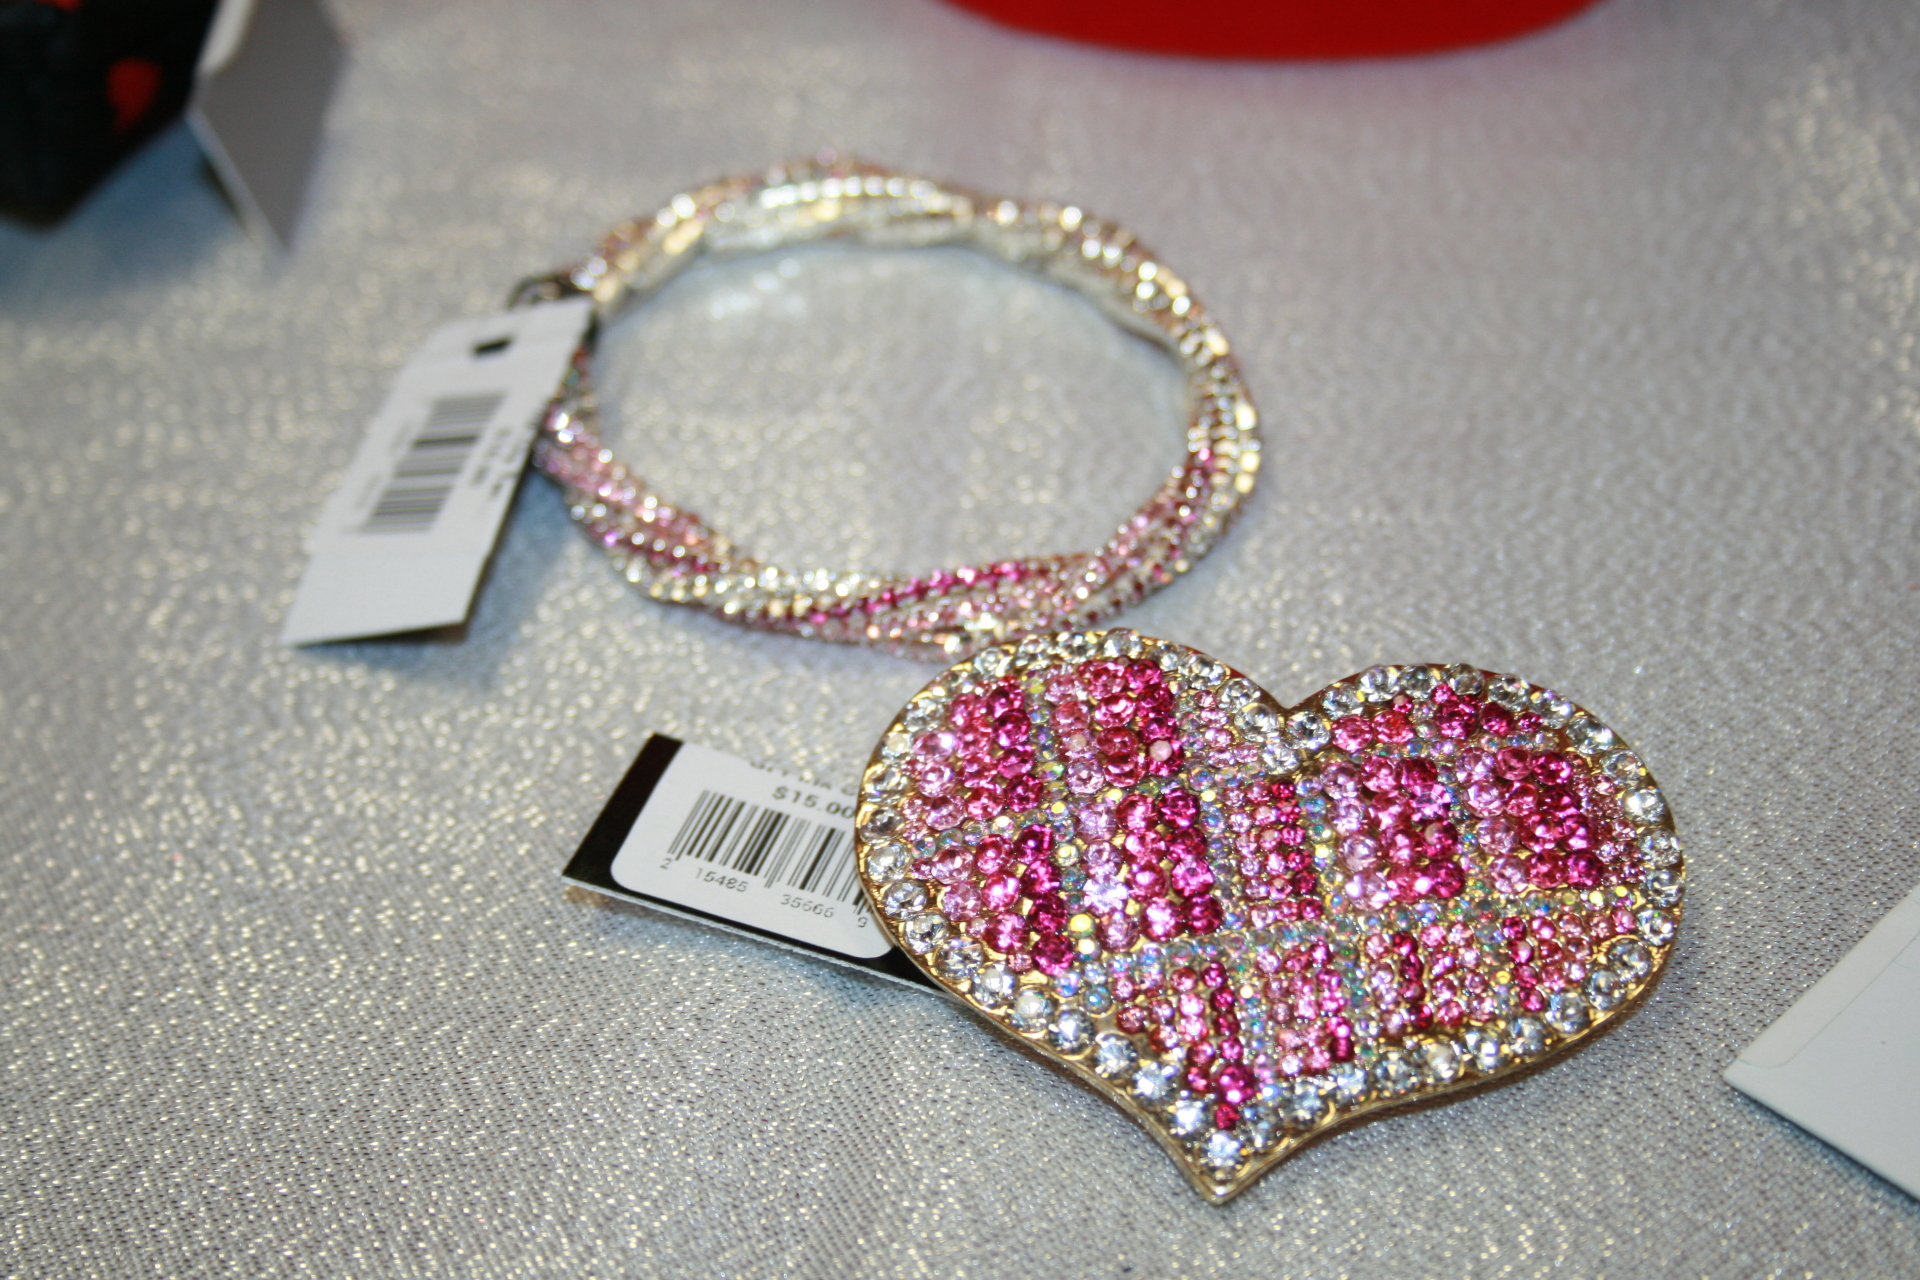 Matching Bracelet and Pin